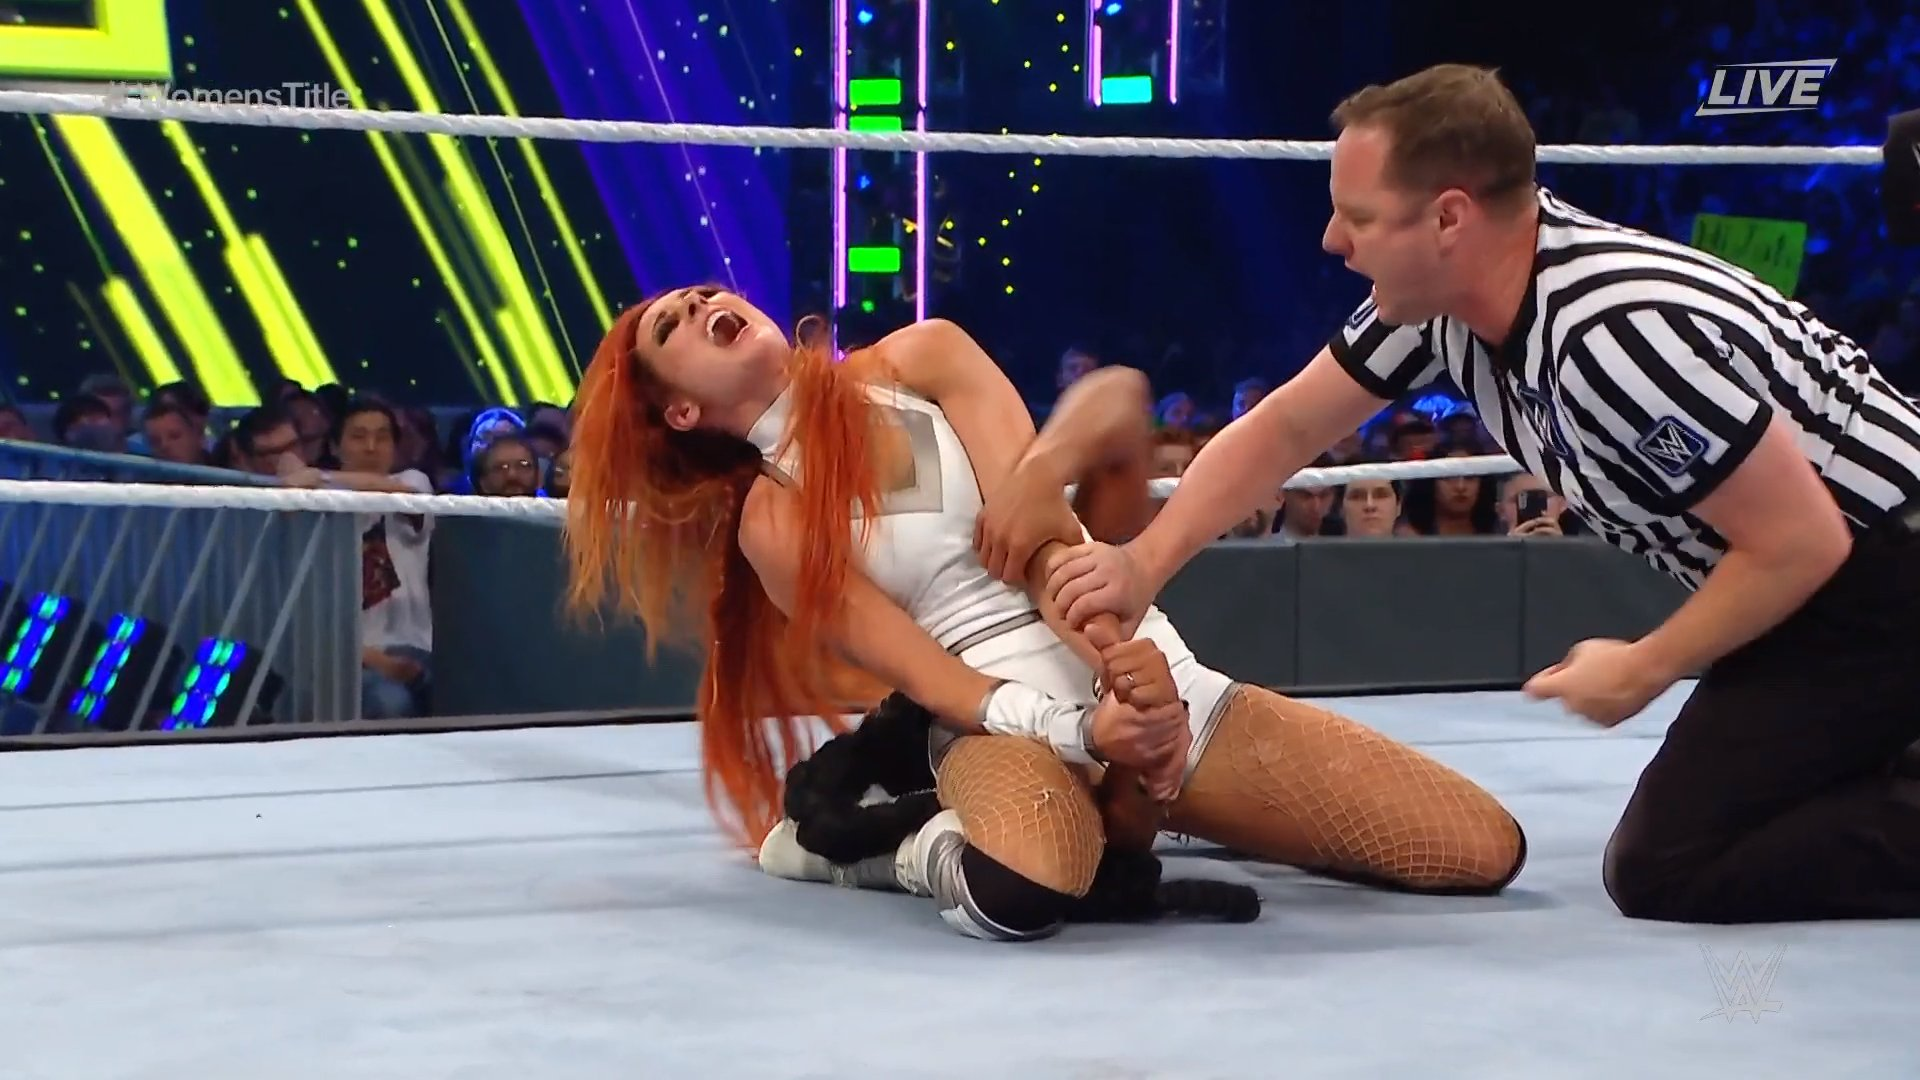 WWE Extreme Rules 2021: Sasha Banks Makes Her Return 1